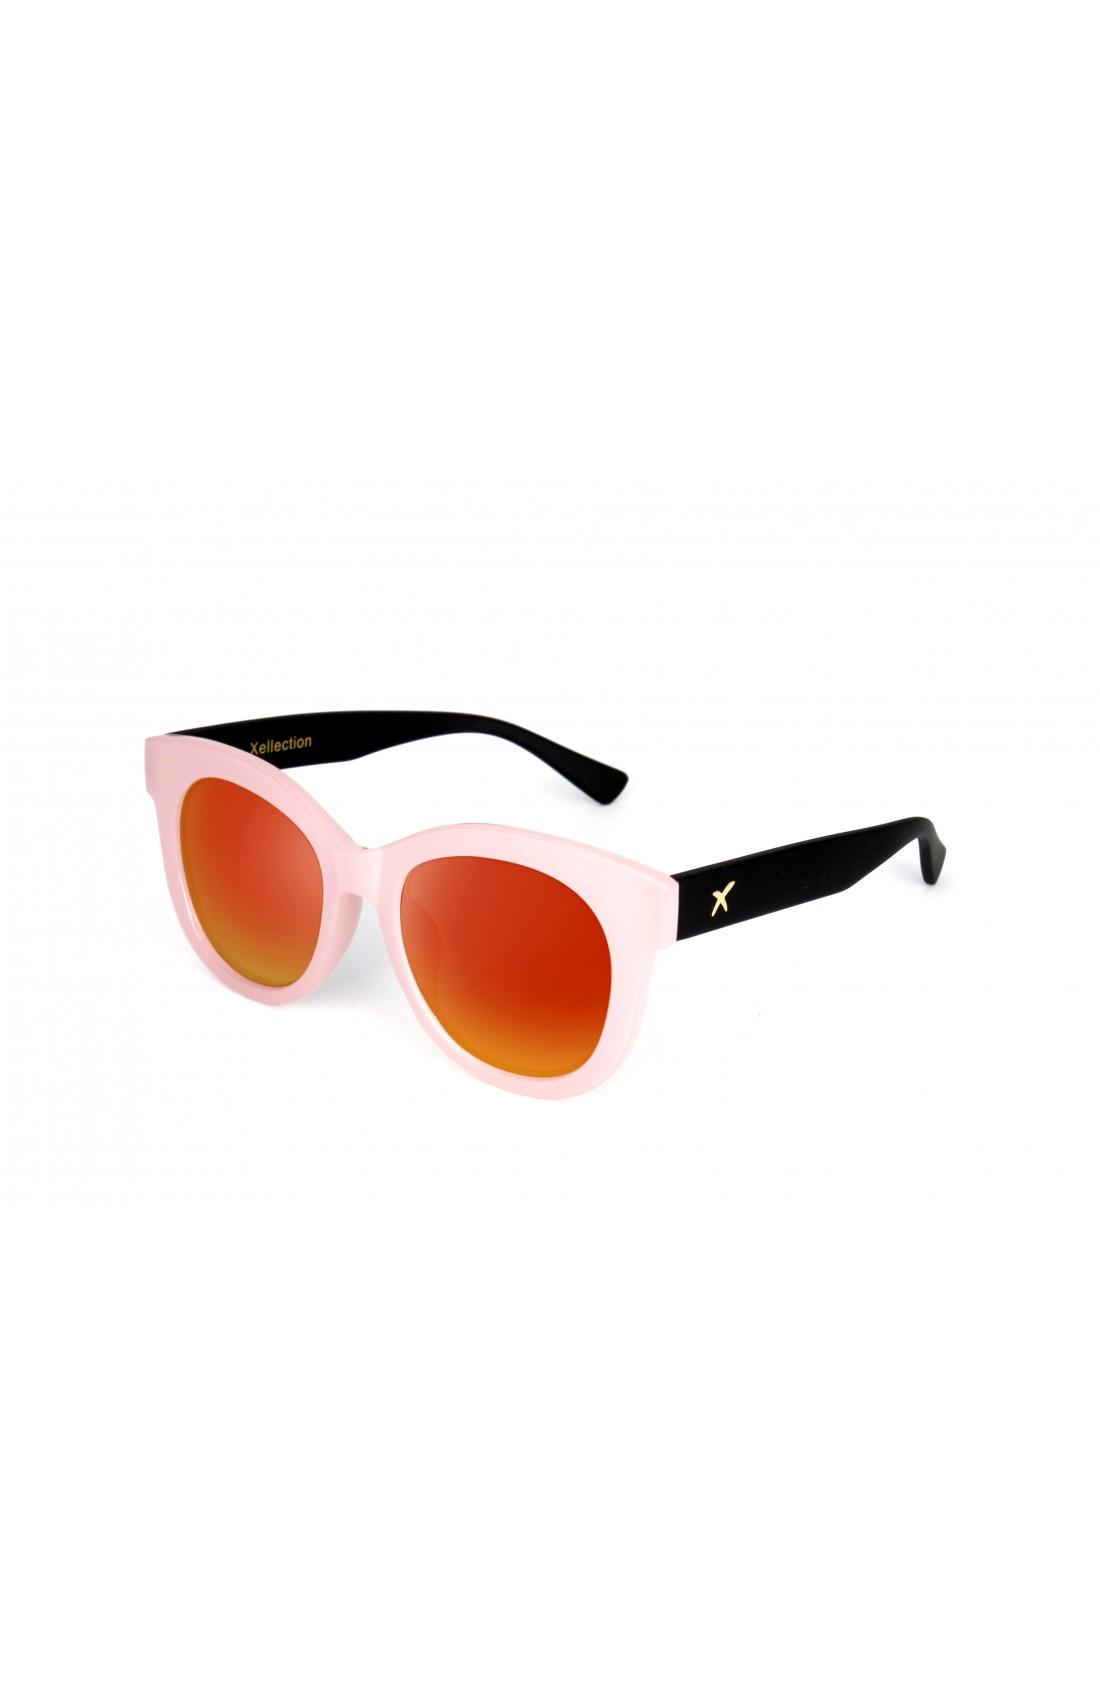 Sunglasses Style P01107_2